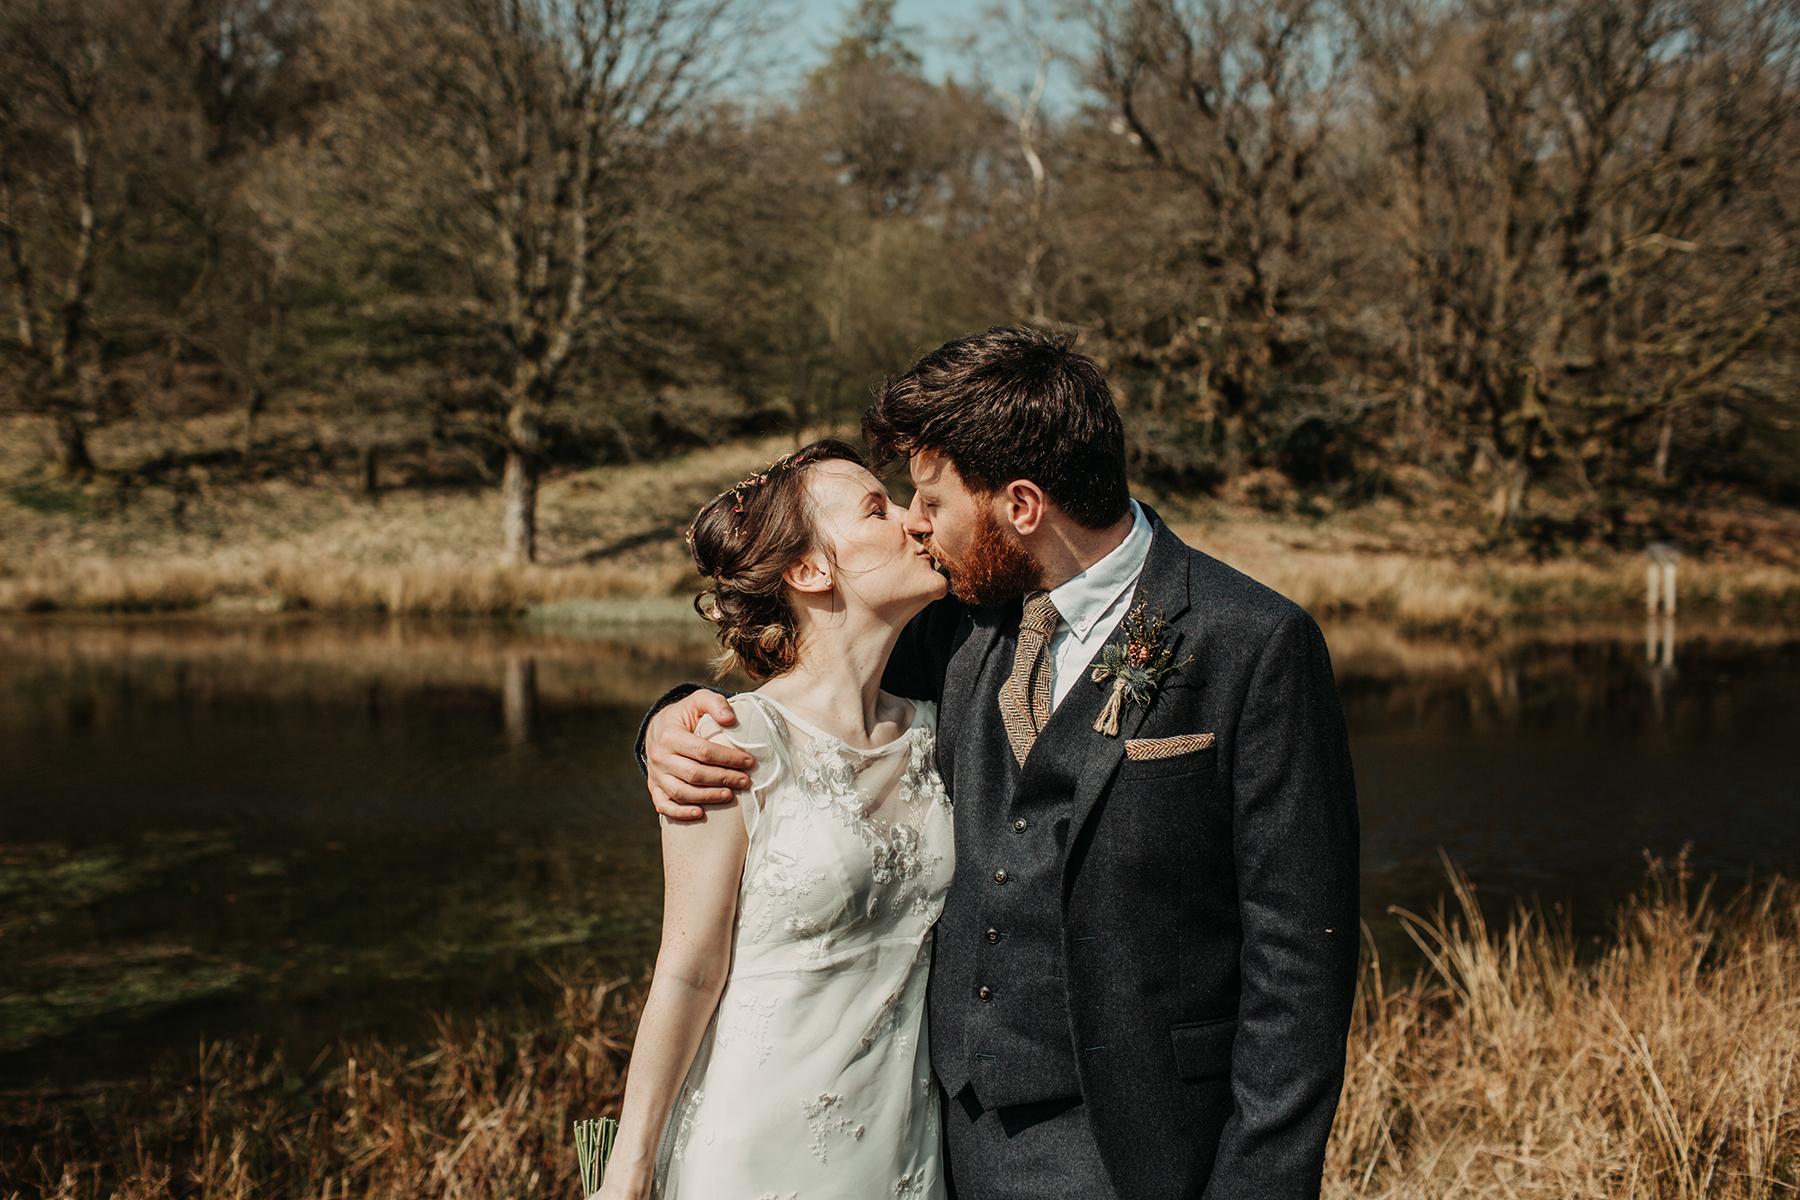 wild-boar-weddings-lake-district.jpg